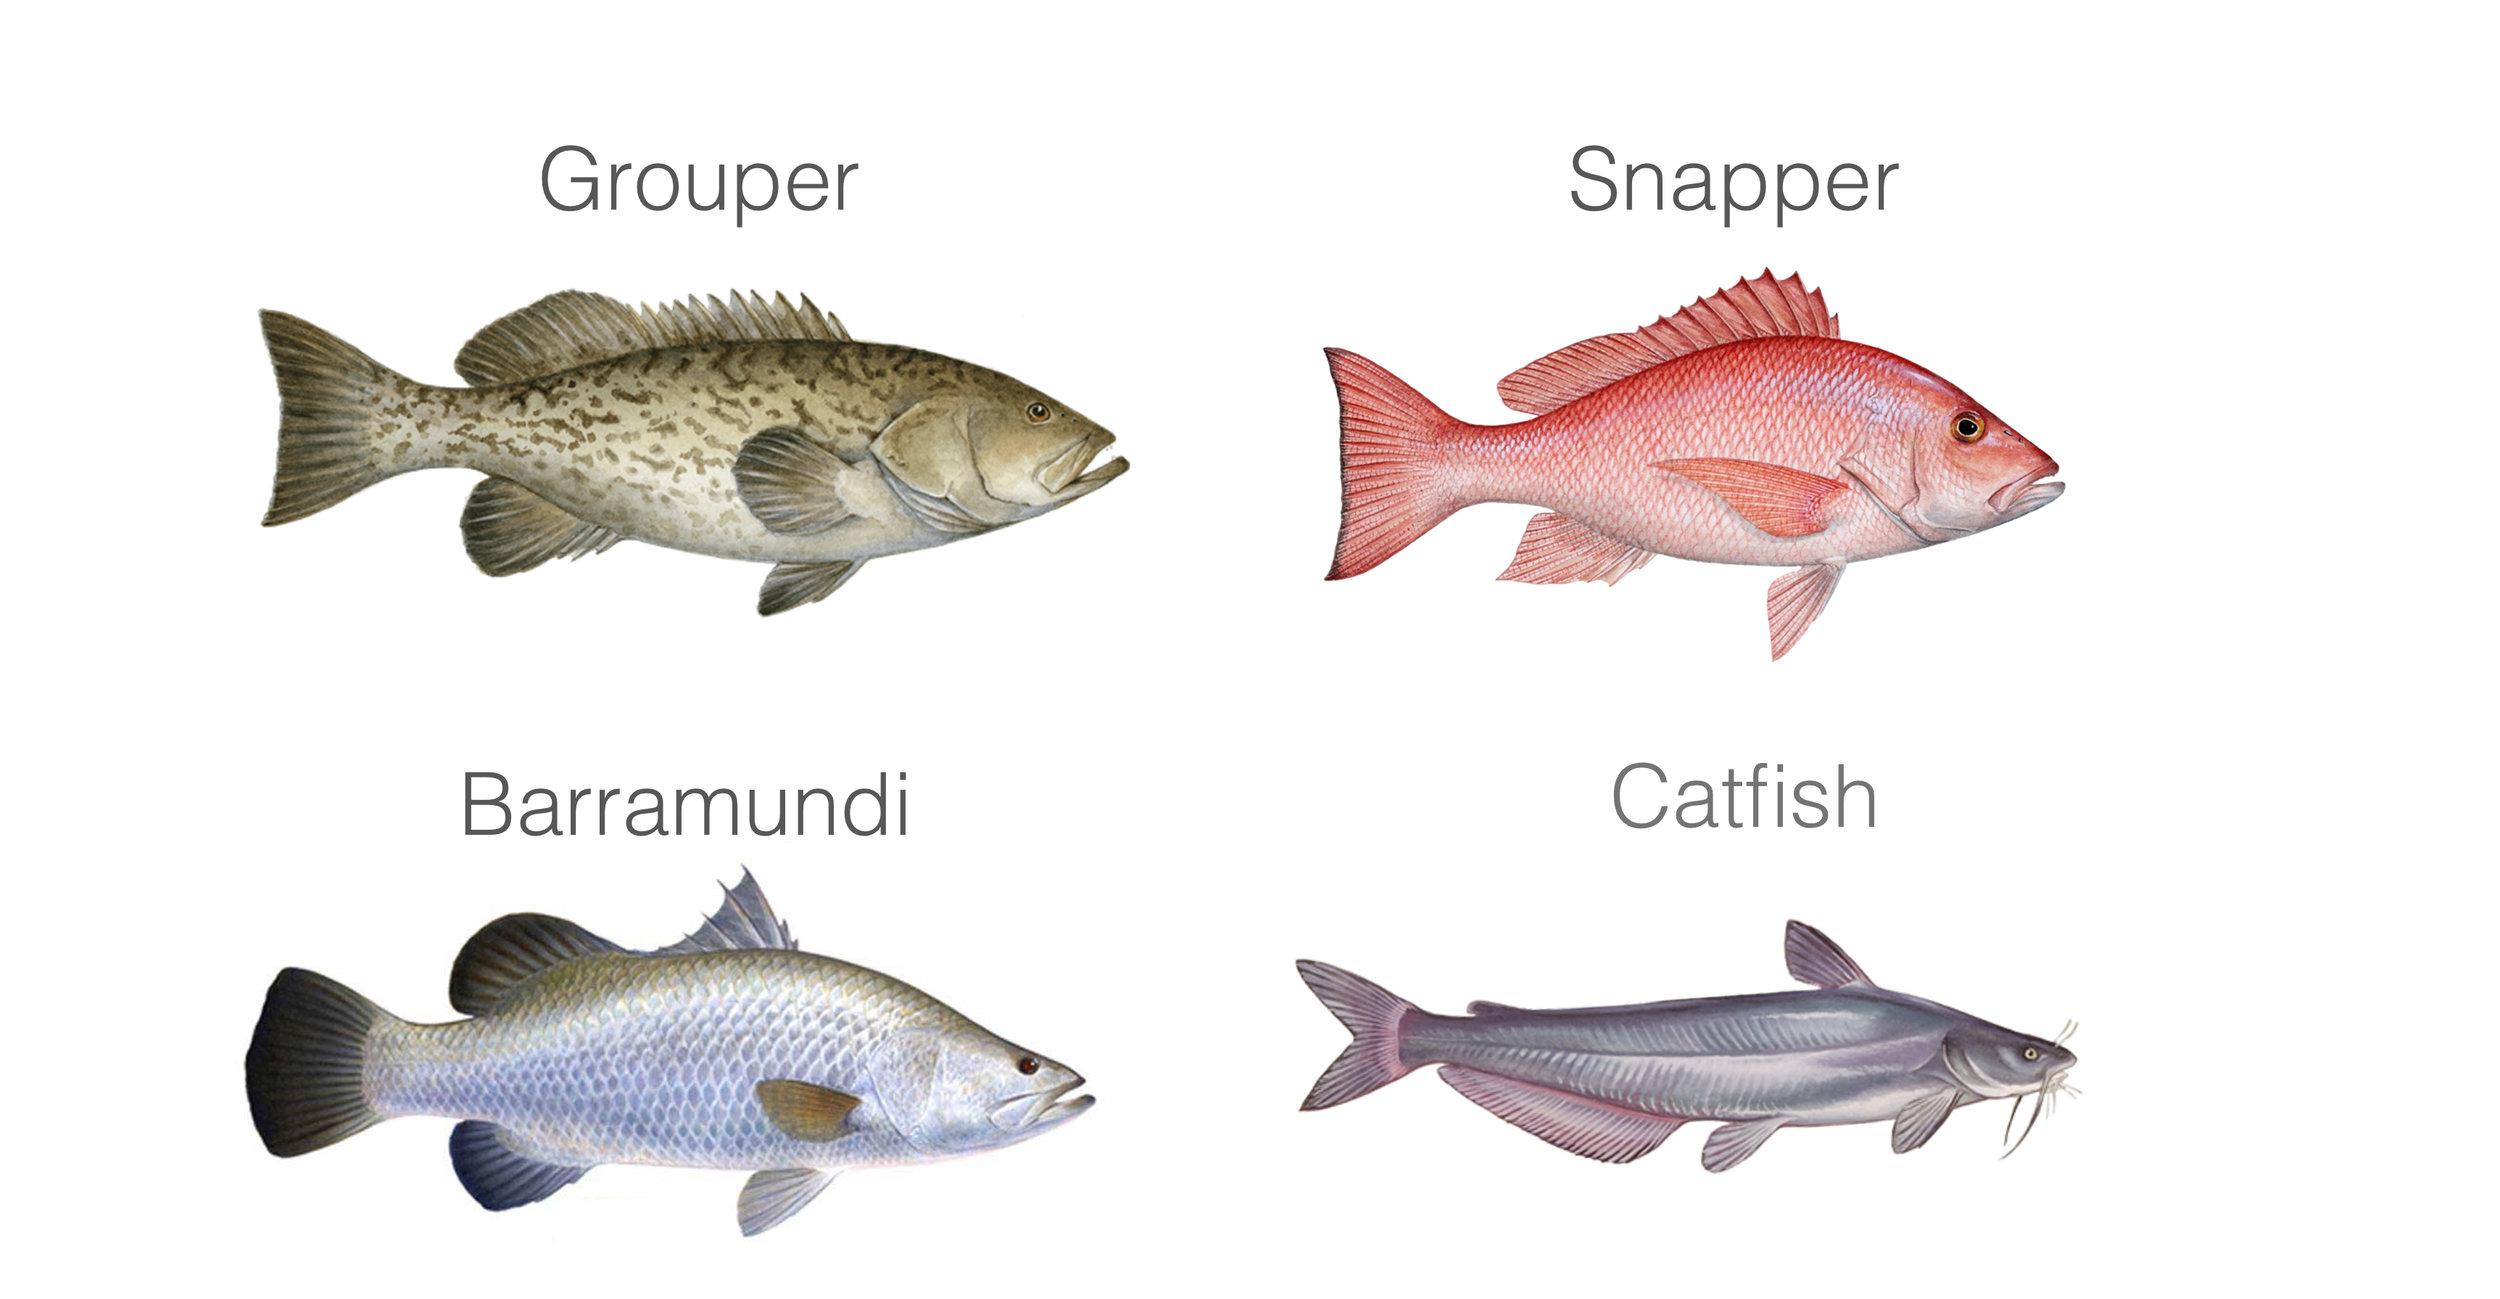 Target fish species at pasir ris and pulau ubin, Grouper, snapper, barramundi, catfish